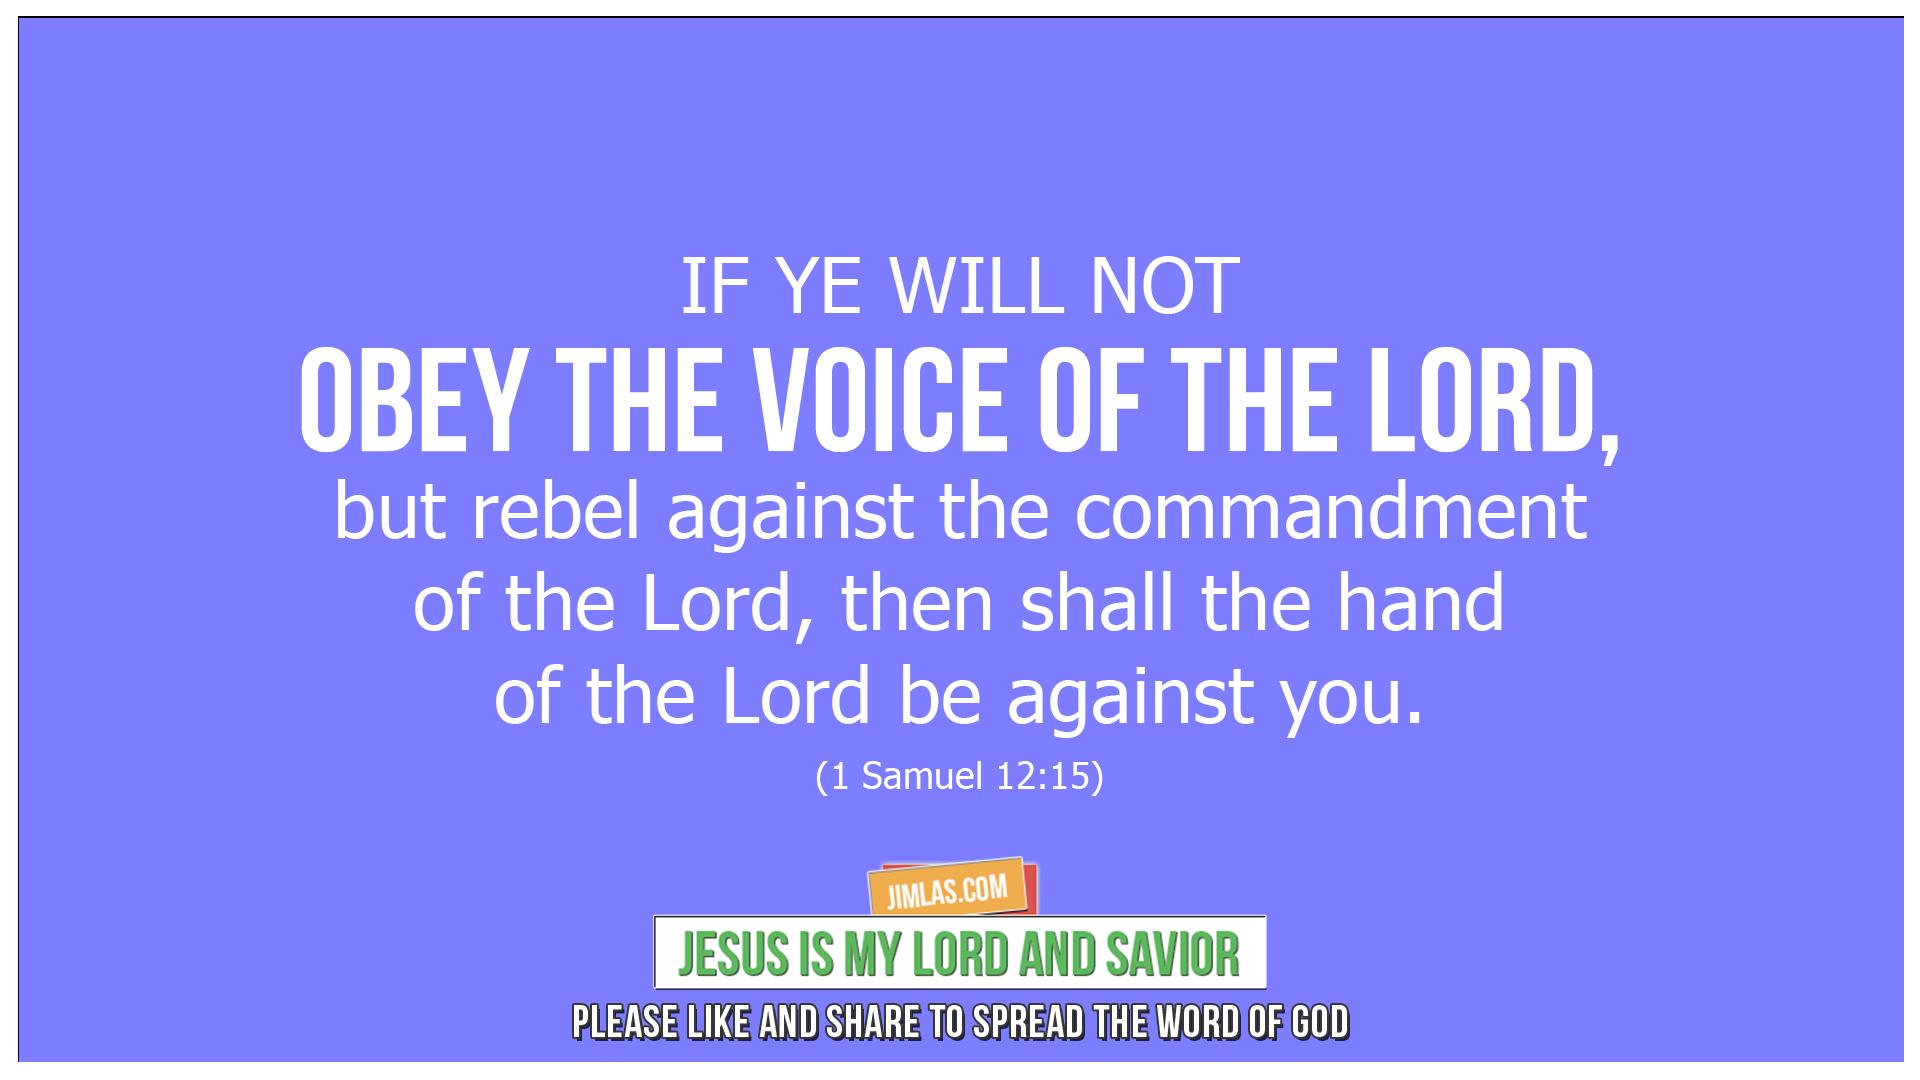 1 samuel 12 15, 1 Samuel 12:15